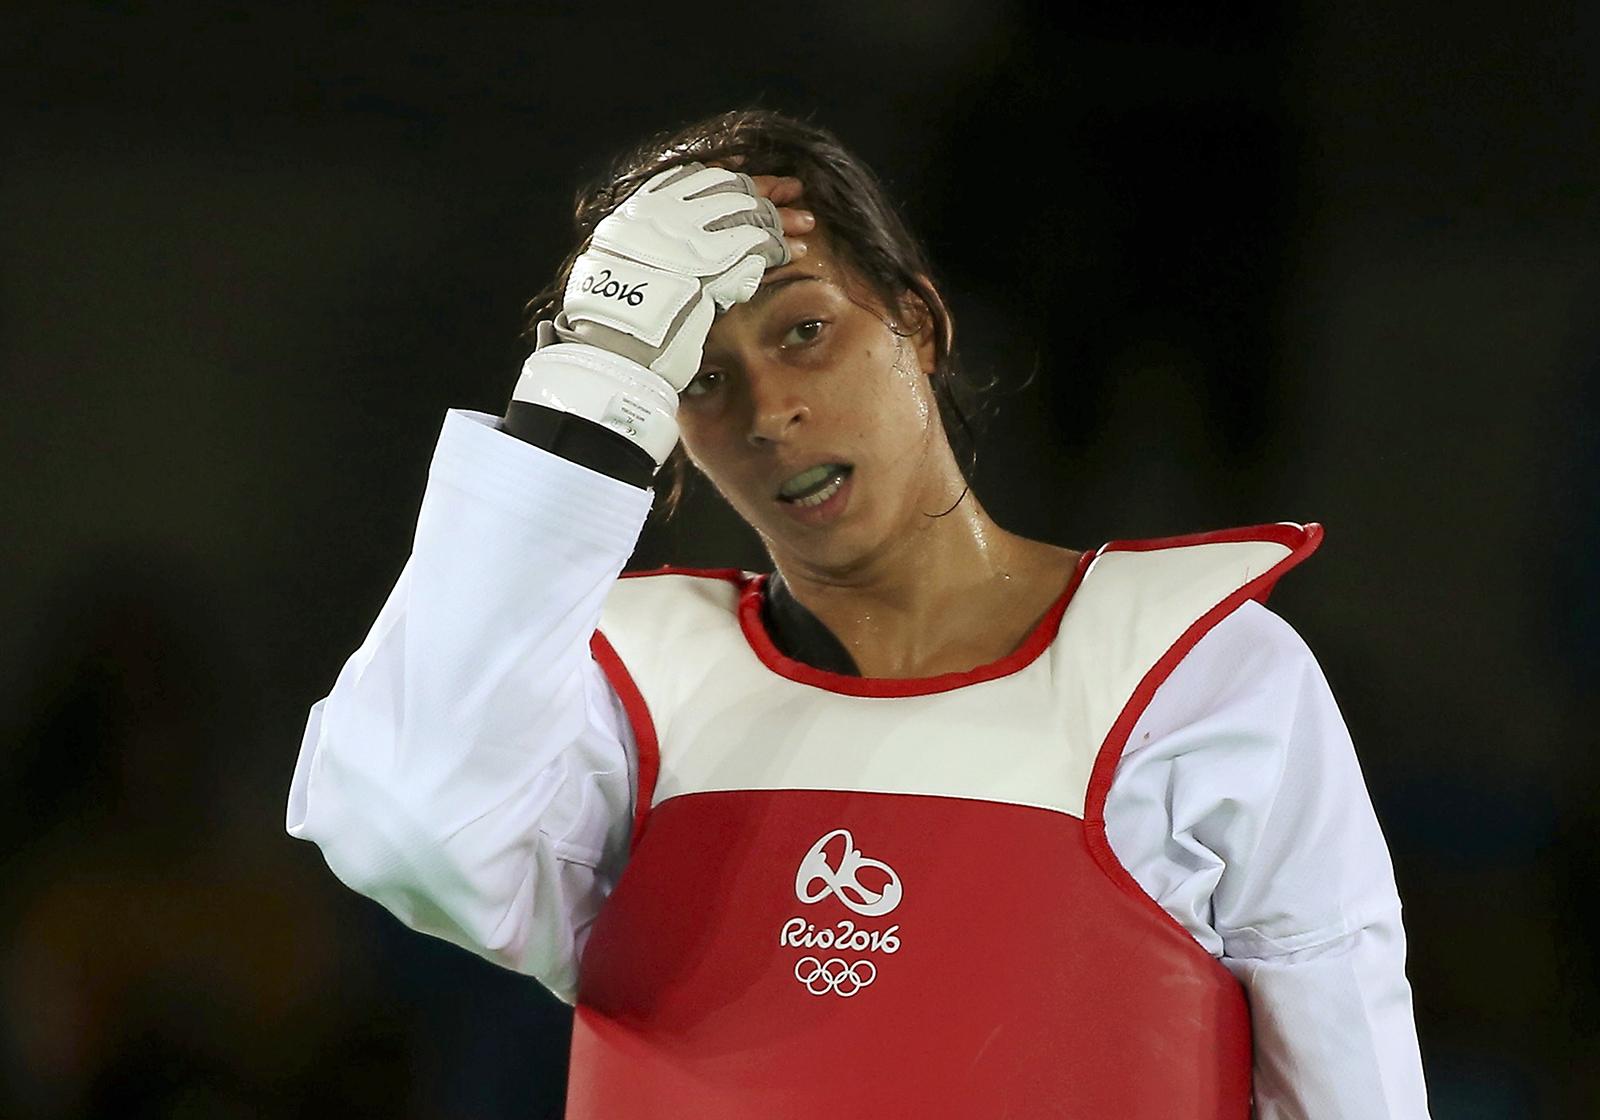 ReshmieOoginkduring the Olympic's Taekwondo - Quarterfinal - Women's +67kg in Rio de Janeiro, Brazil on Aug. 20, 2016.